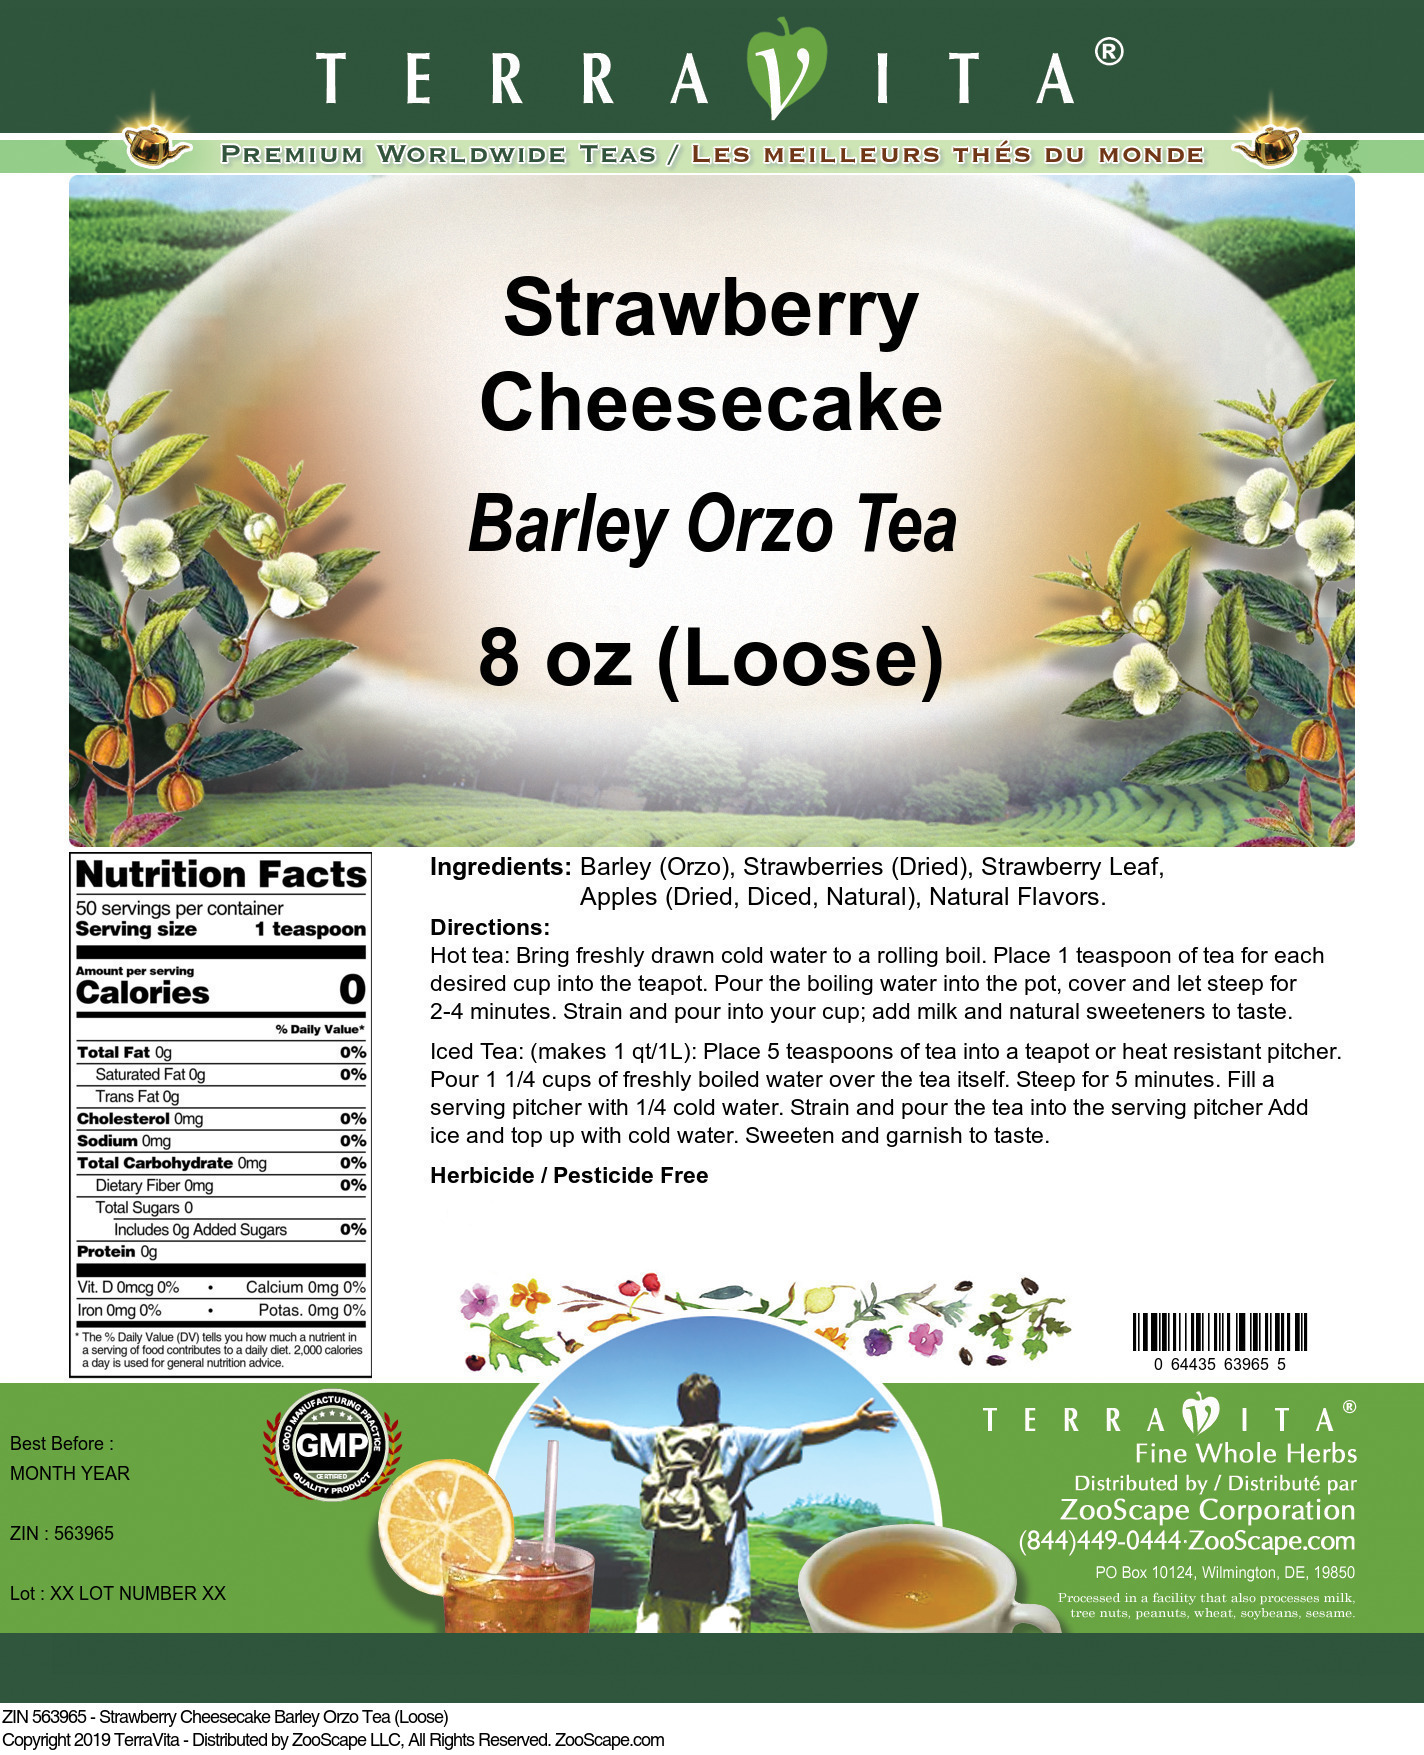 Strawberry Cheesecake Barley Orzo Tea (Loose)